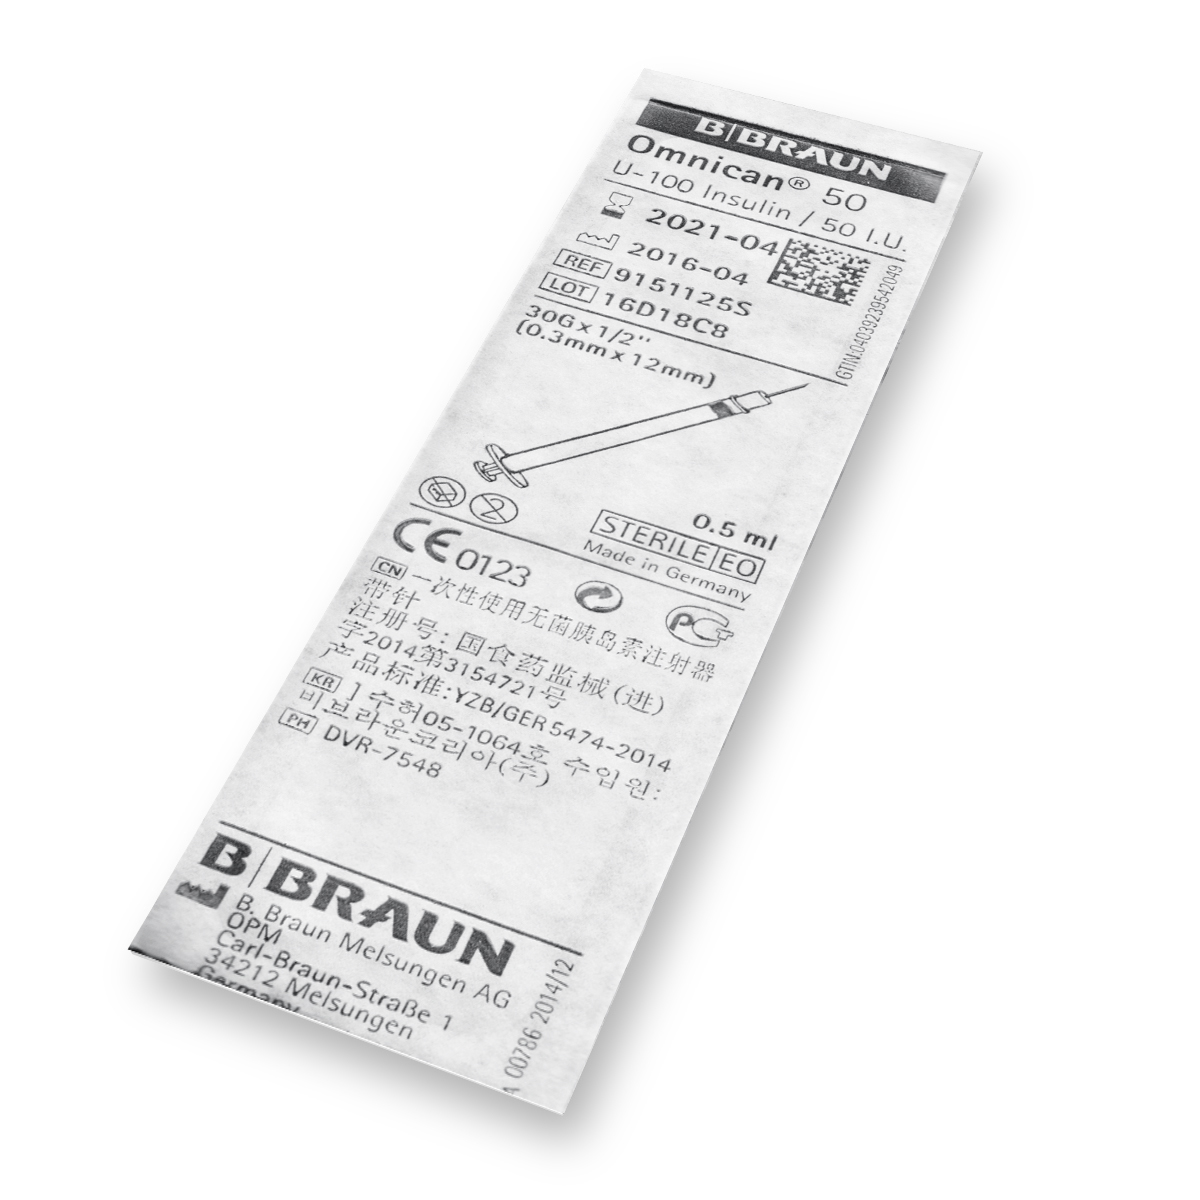 0 5ml BBraun Omnican 30G insulin syringe (12mm needle)